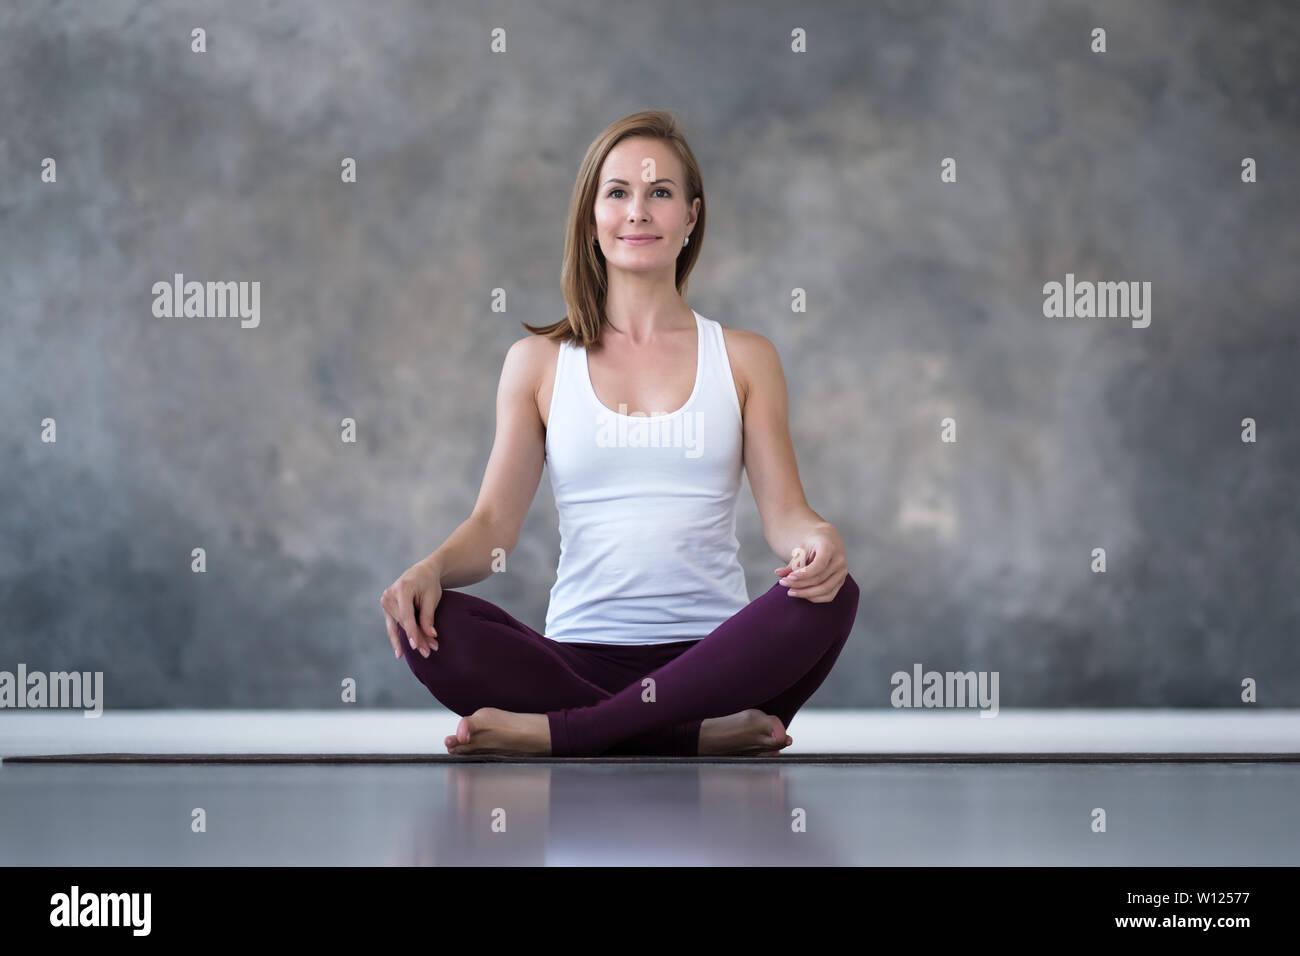 Caucasian woman practicing yoga, doing sukhasana or easy seat pose - Stock Image